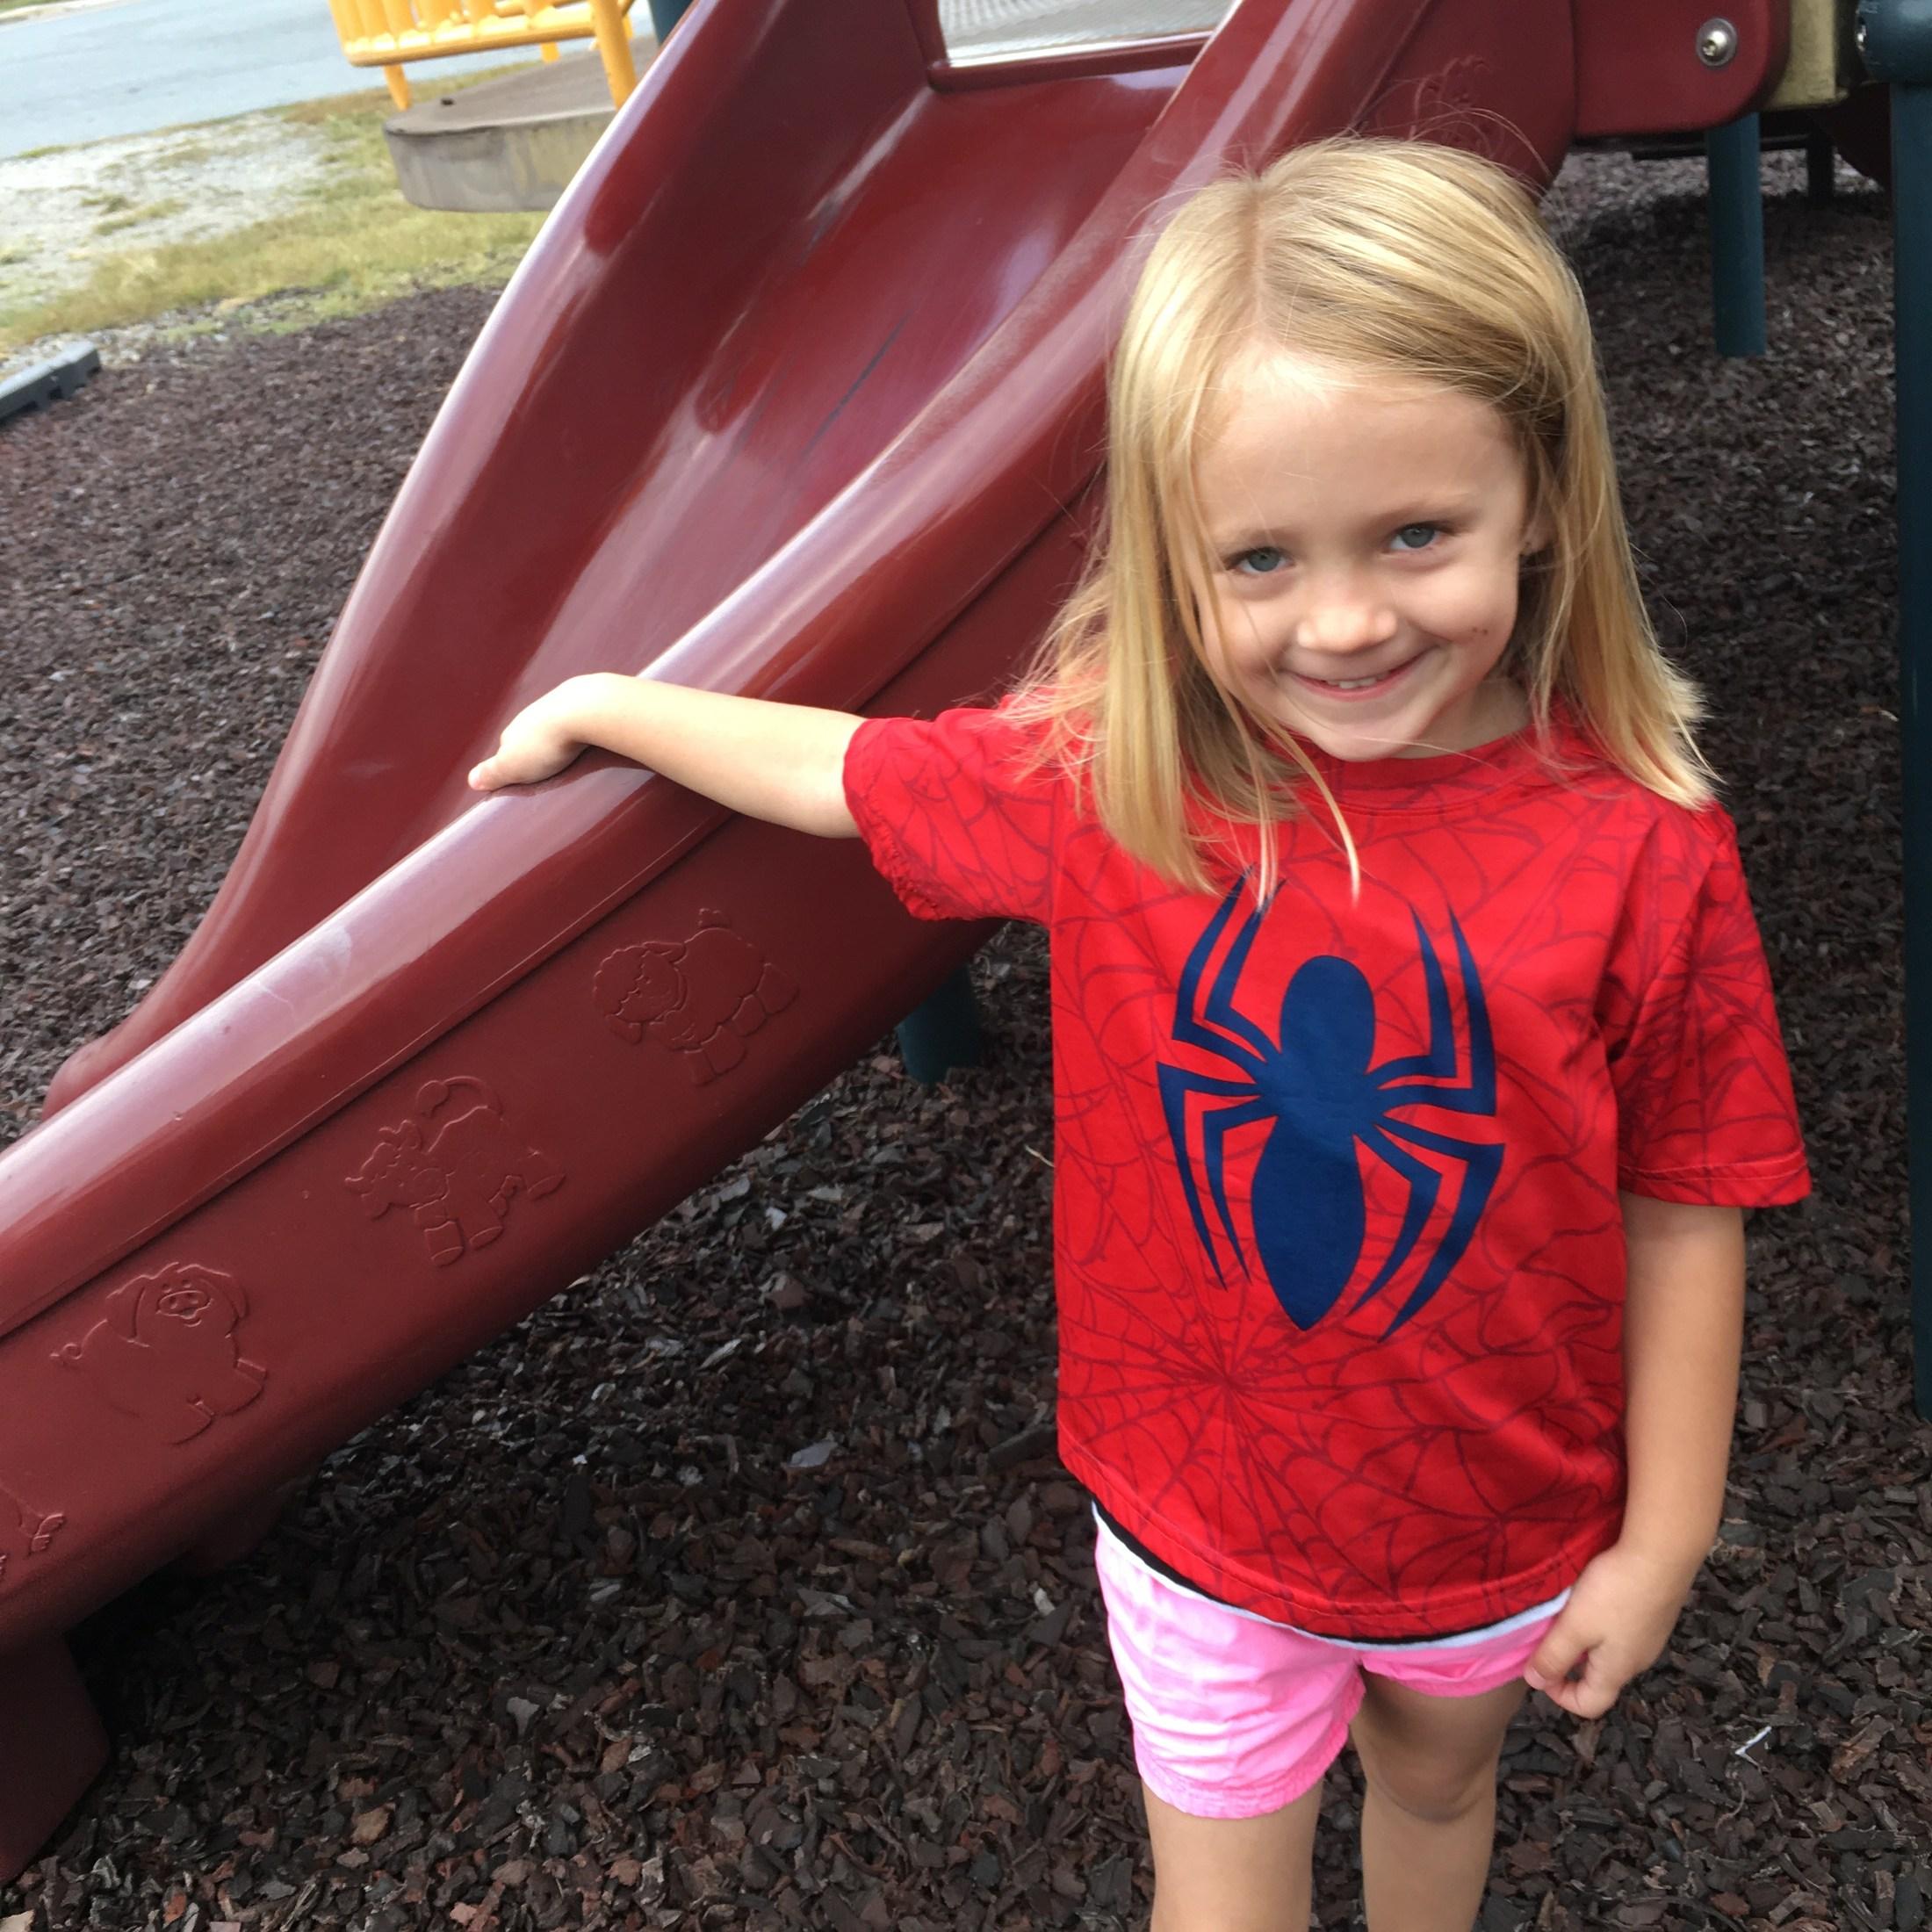 girl in spiderman tshirt on playground